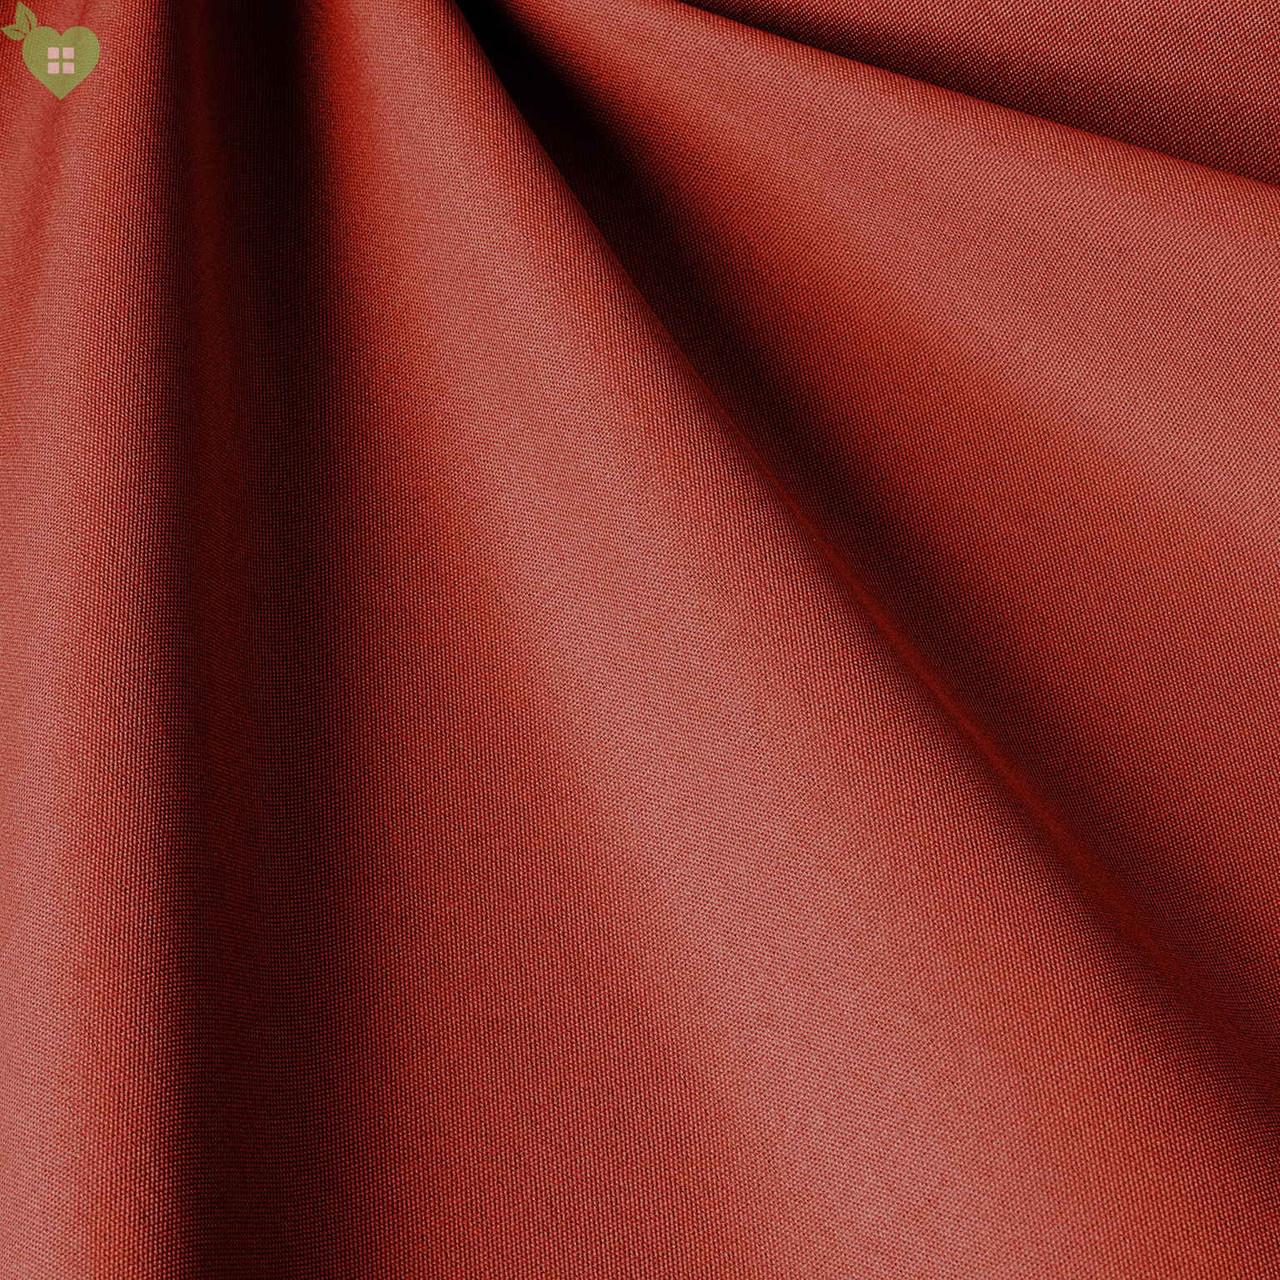 Ткань для улицы: Дралон (Outdoor) 400333v02